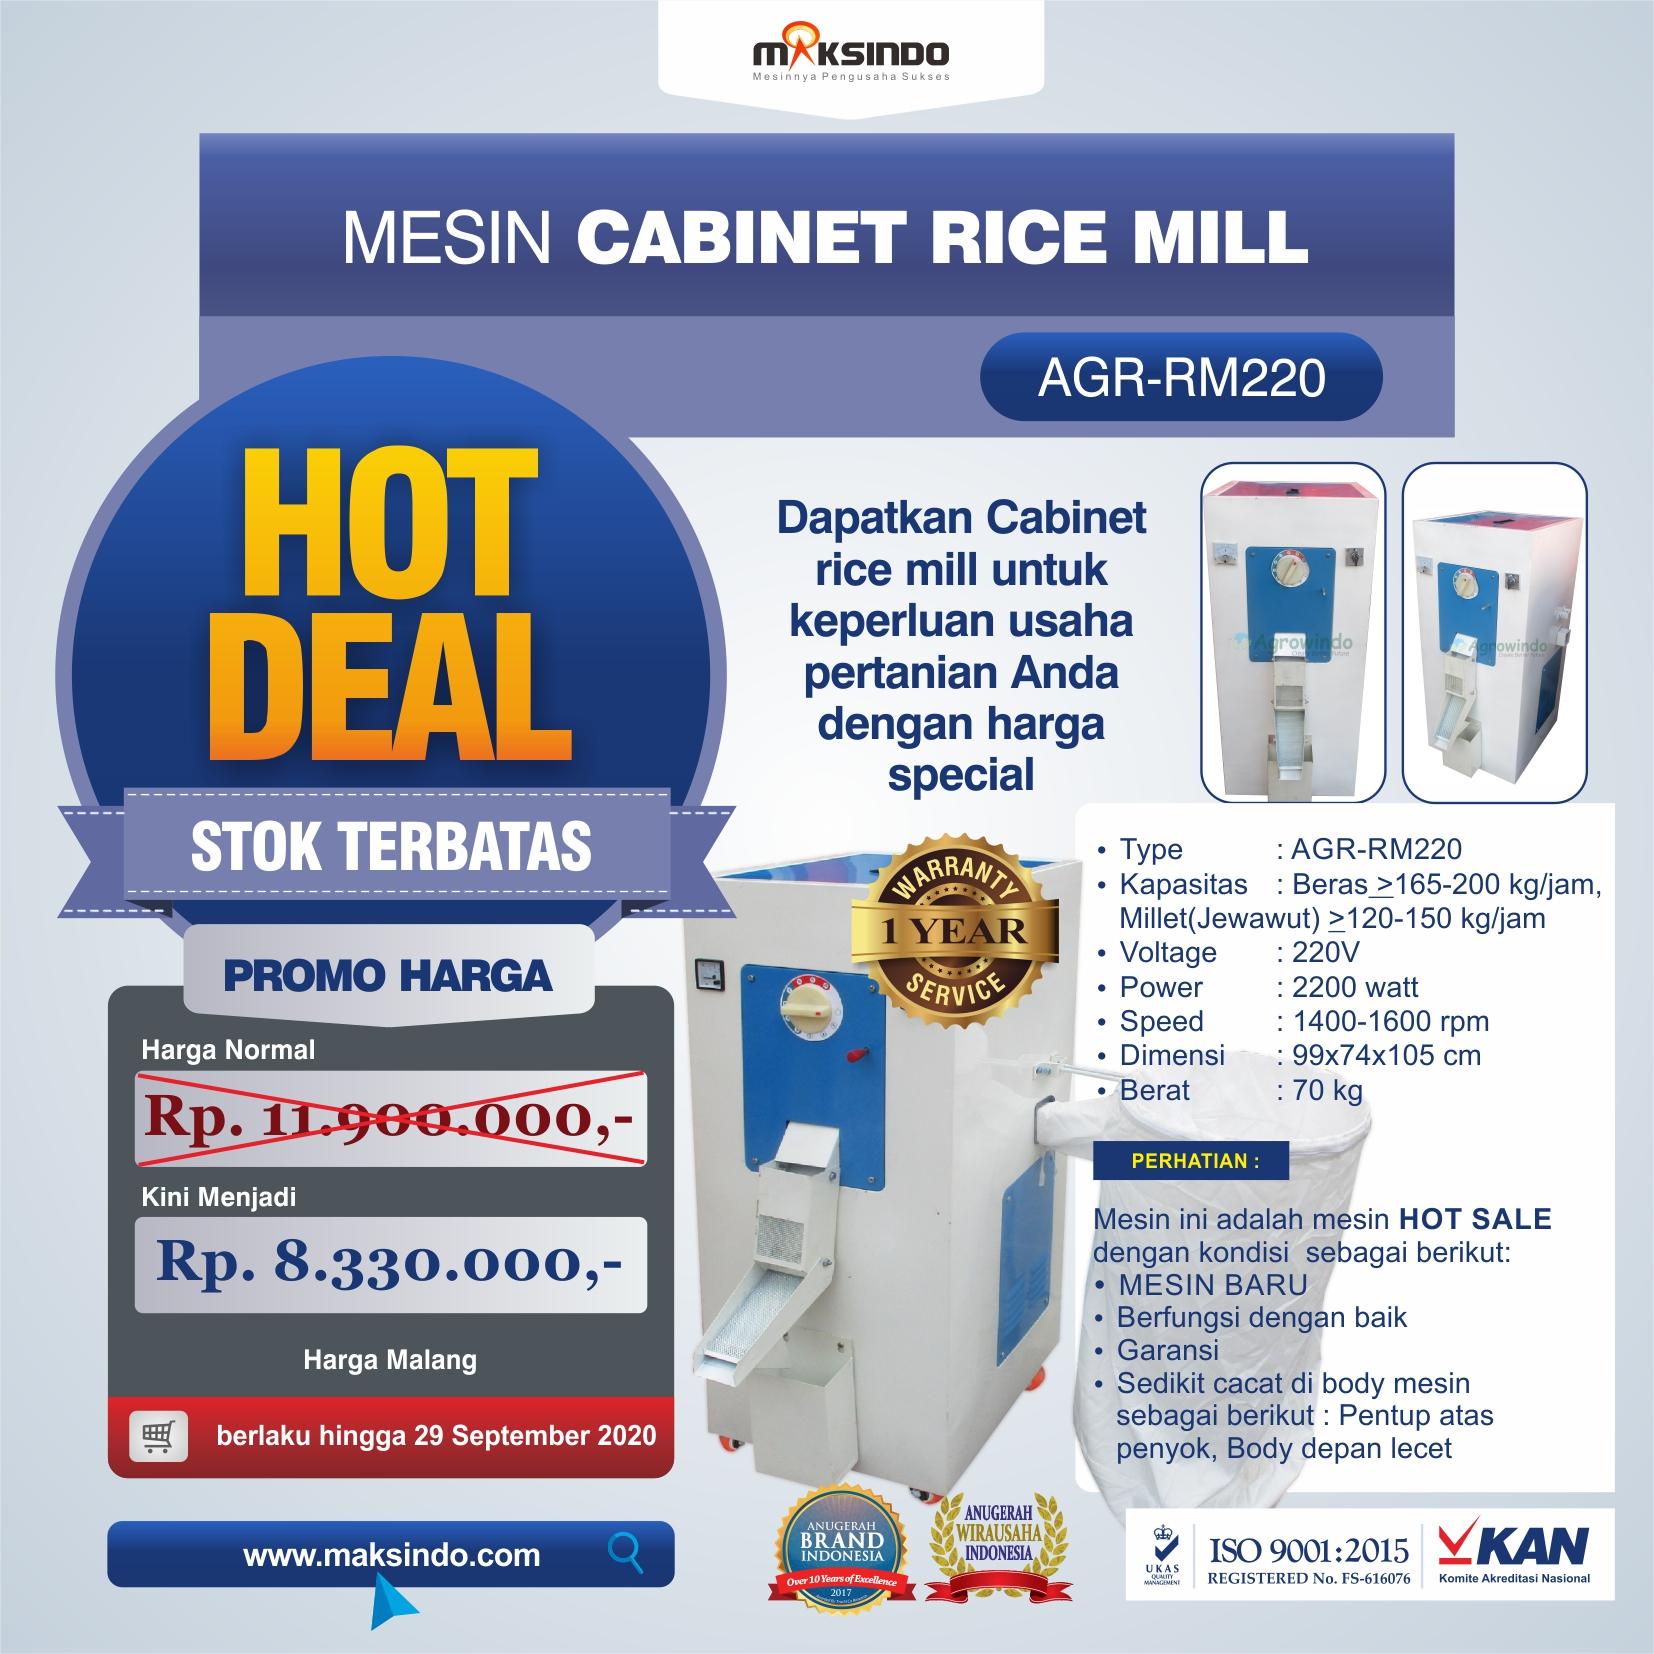 Jual Mesin Cabinet Rice Mill AGR-RM220 di Yogyakarta